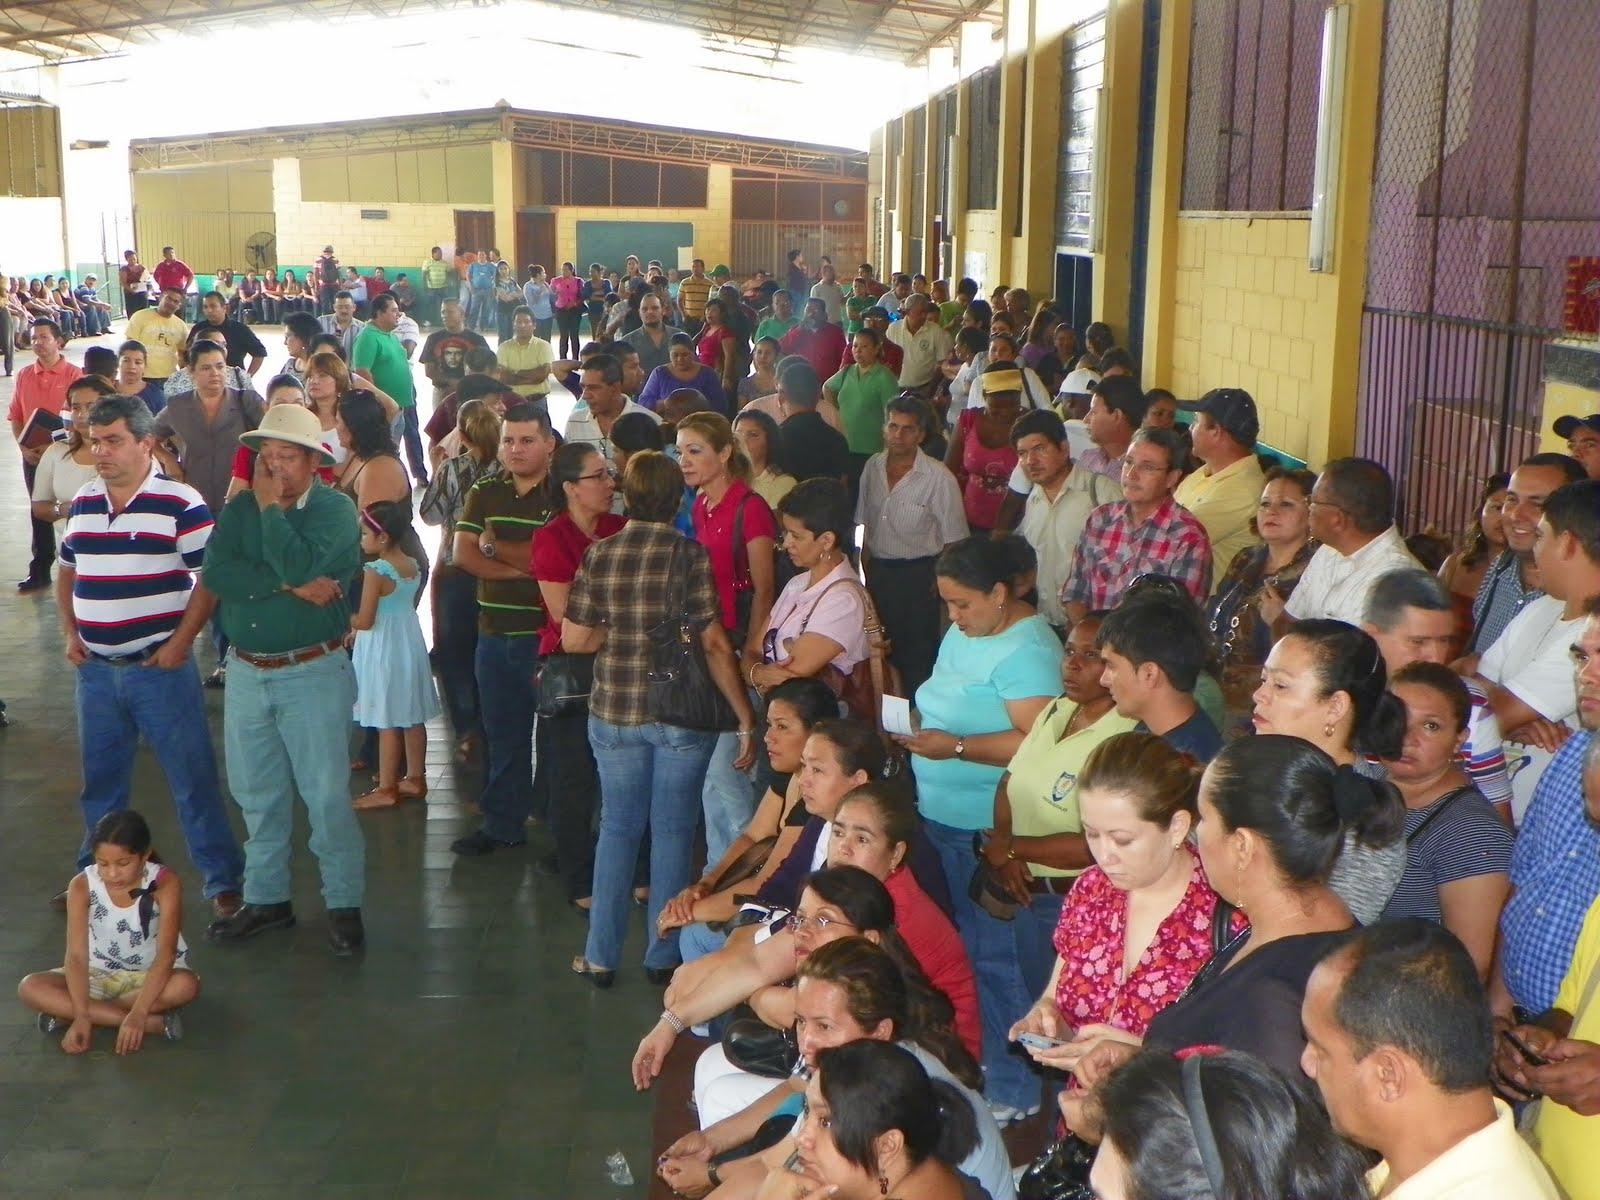 San Pedro Sula Los docentes pertenecientes a la Federaci³n de Organizaciones Magisteriales de Cortés han convocado a este da a asamblea municipal